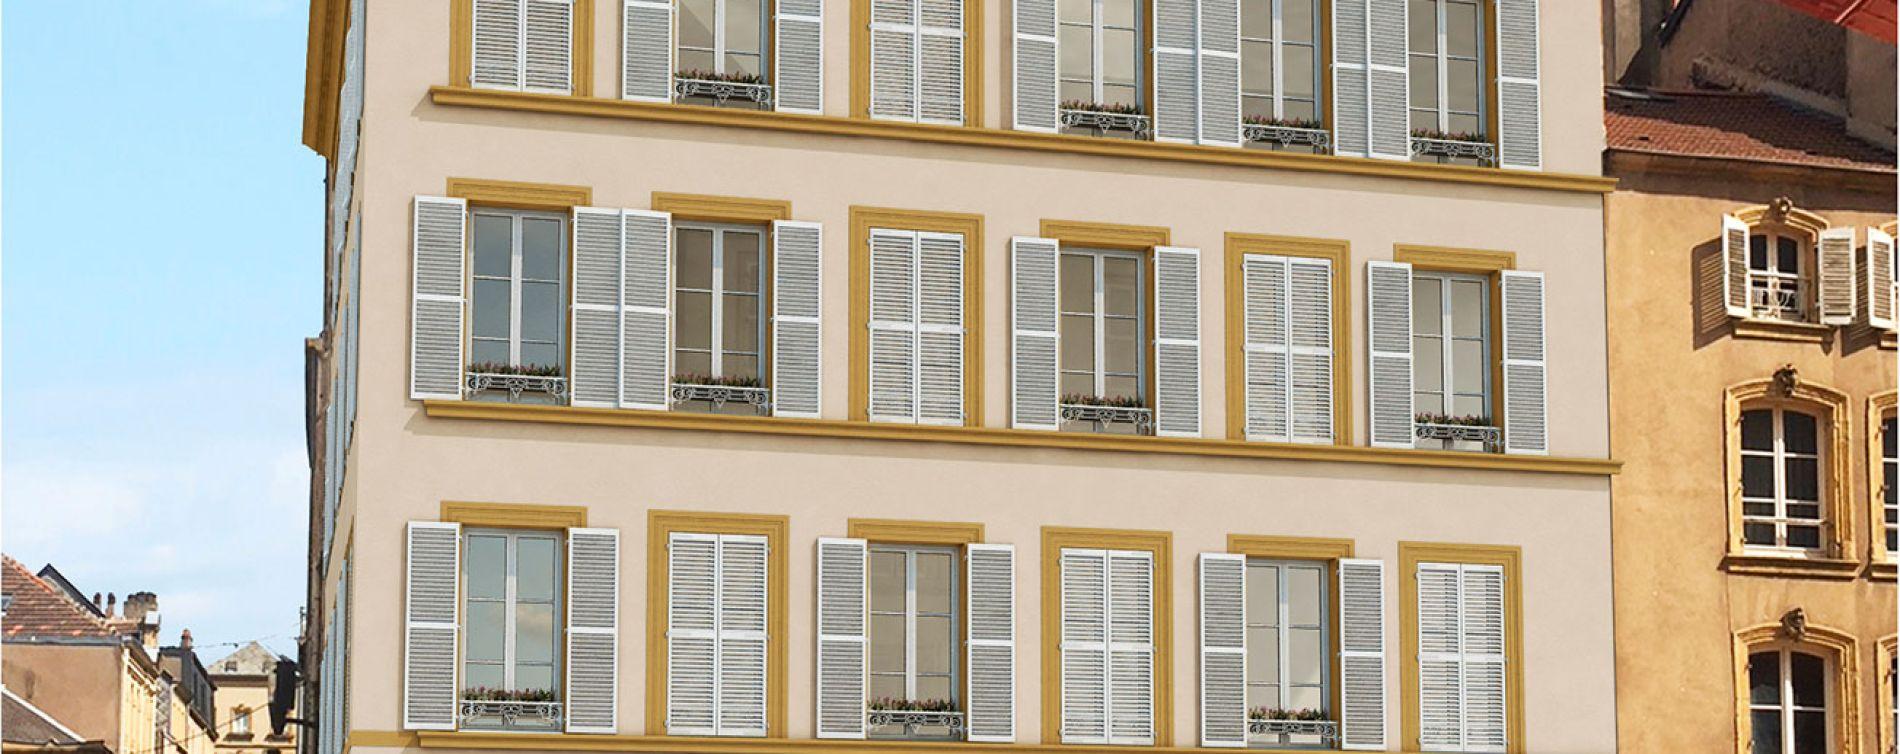 Résidence Les Clercs à Metz